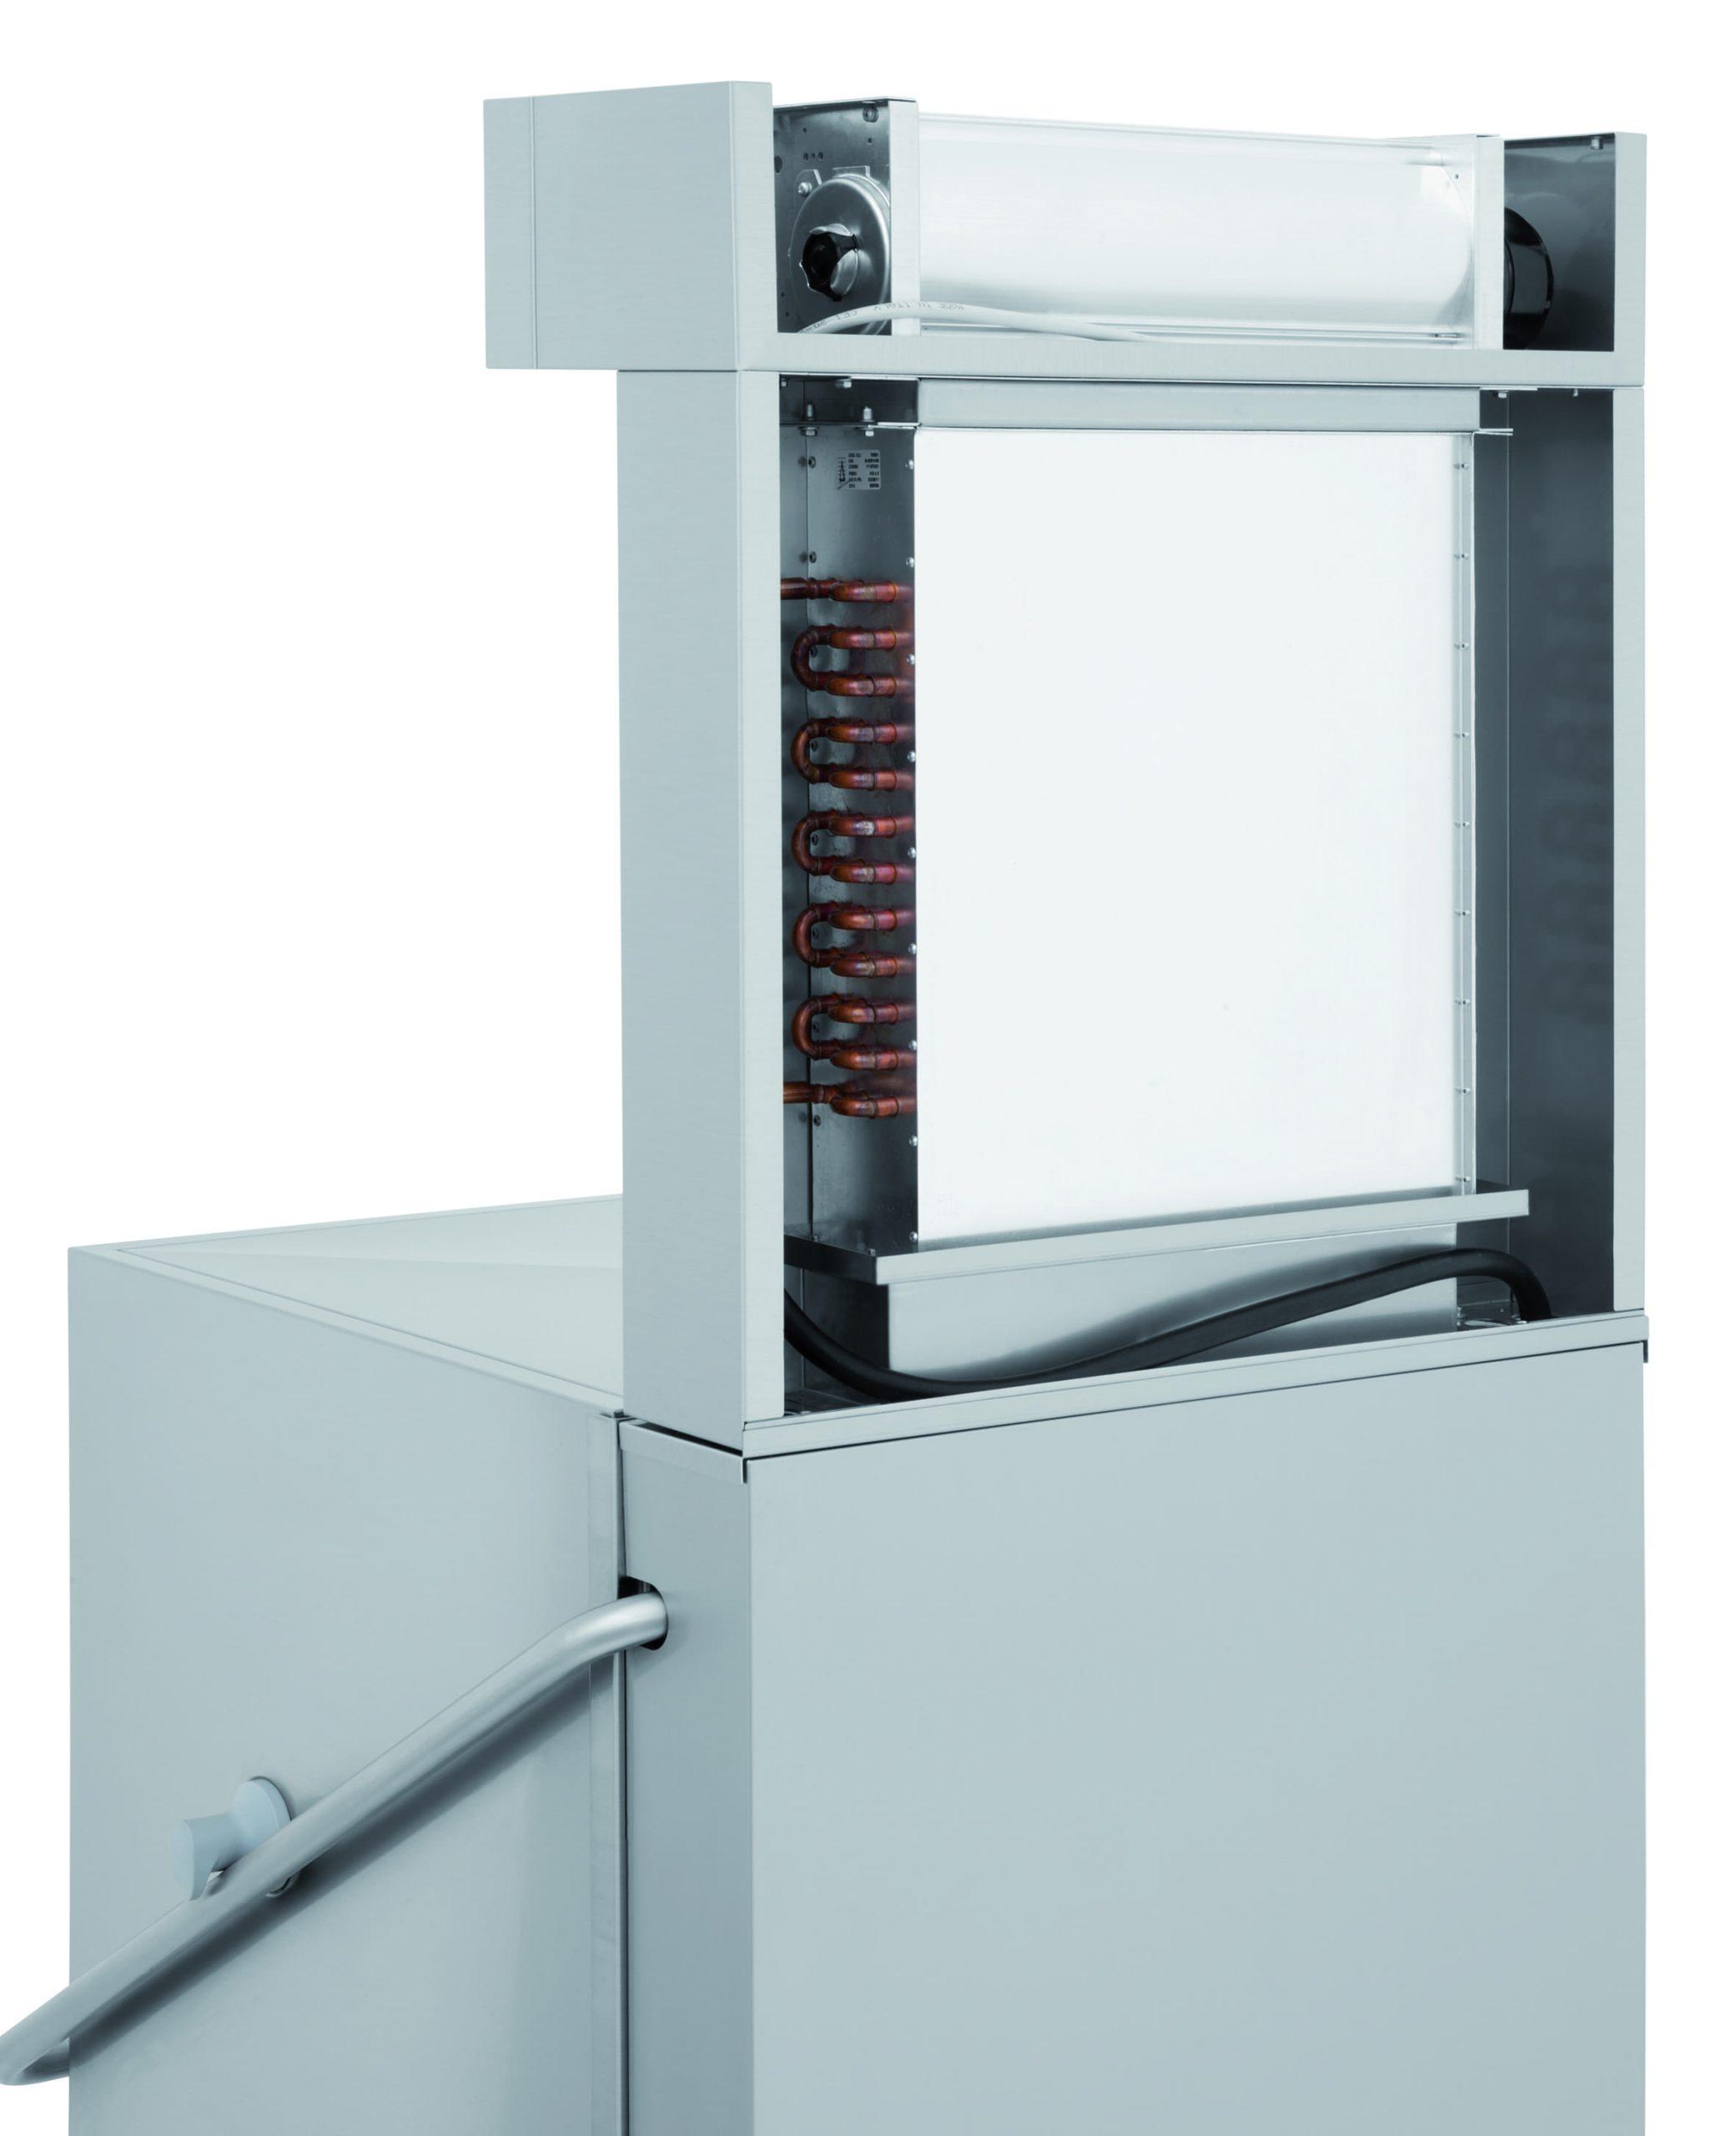 professional dishwasher t1215 project system italia